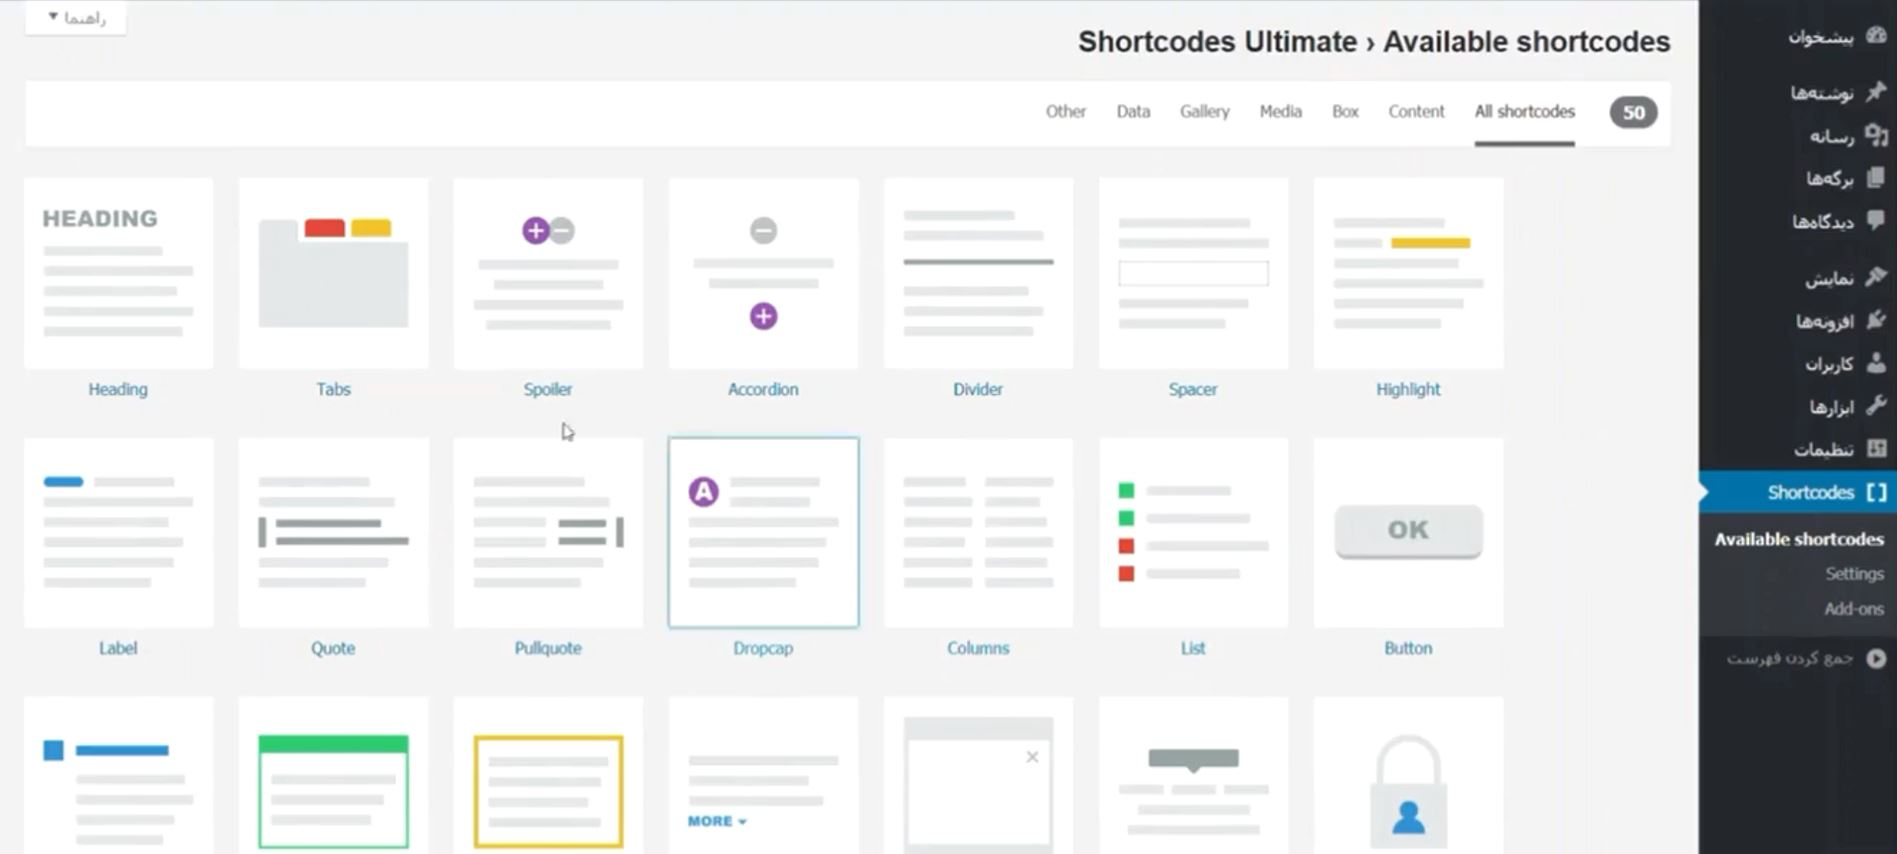 Shortcodes Ultimate menu